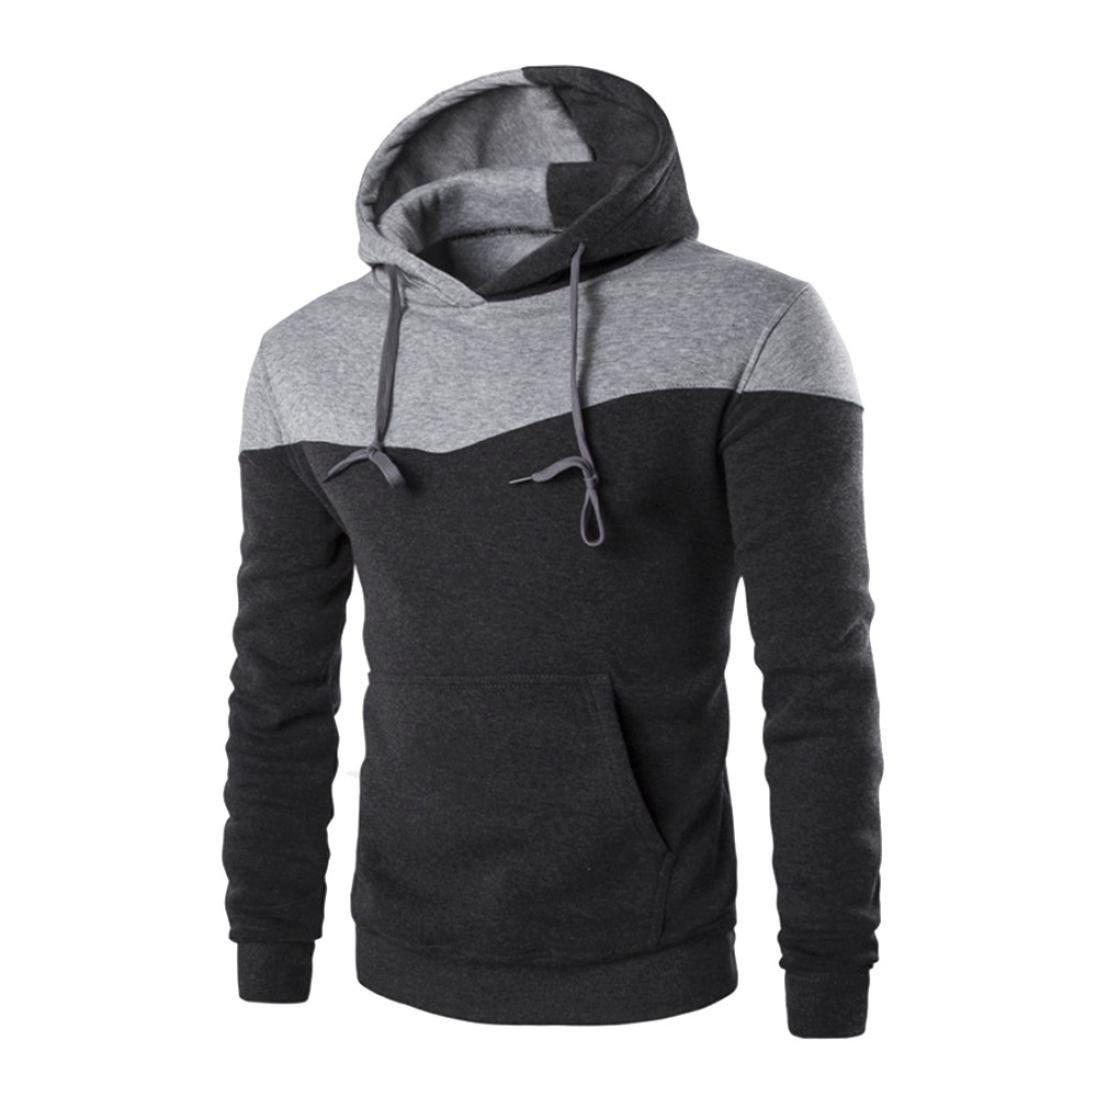 Napoo Clearance Mens TOP Fashion Pocket Patchwork Slim Solid Hooded Sweatshirt Outwear (XL, Dark Gray)